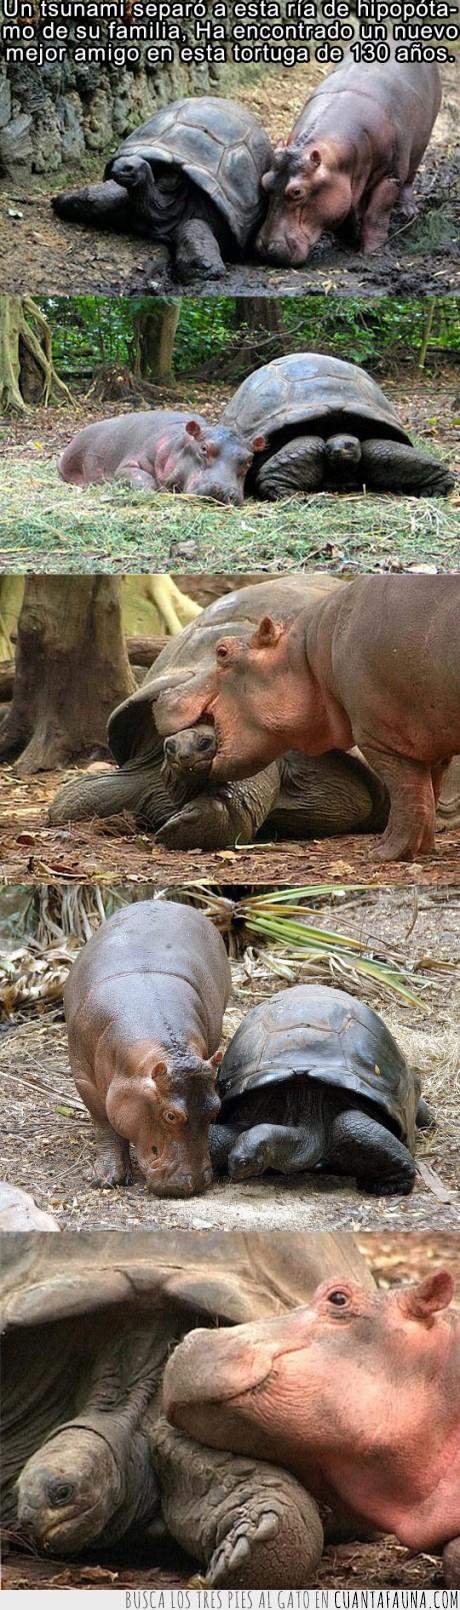 amigo,familia,hipopotamo,tortuga,tsunami